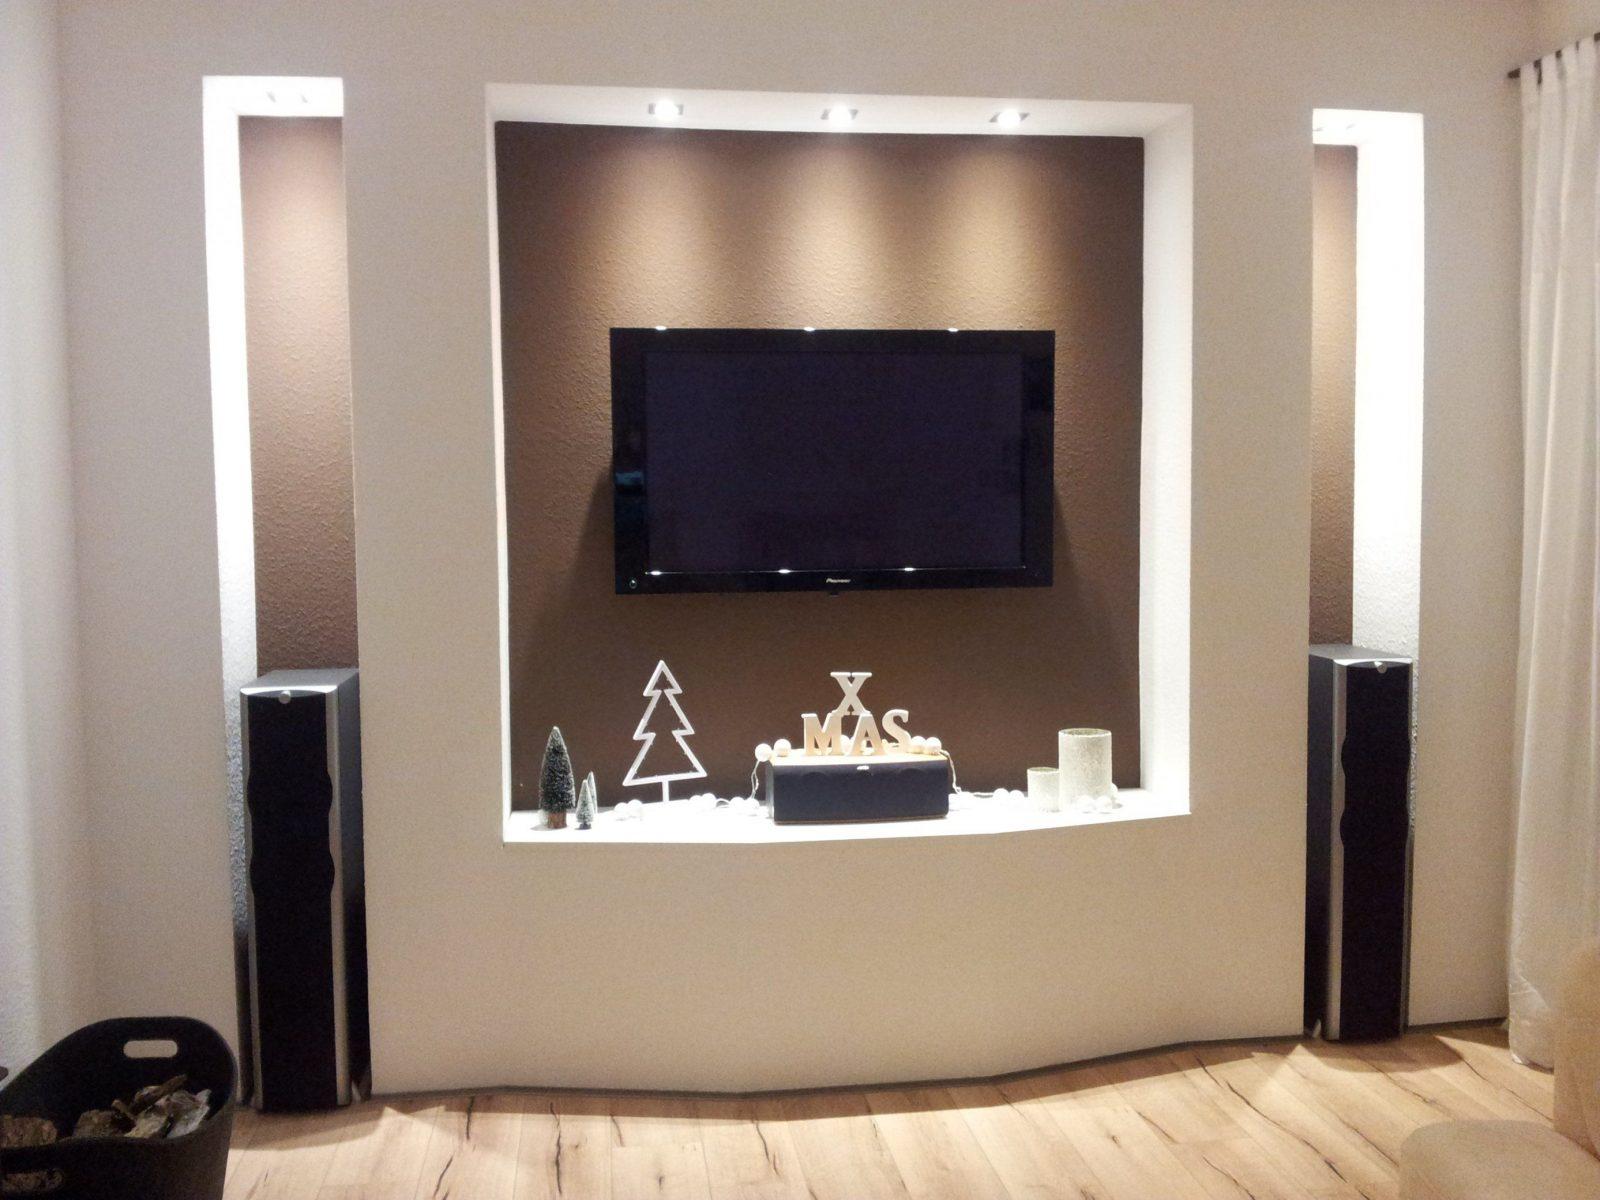 Nauhuricom Tv Wand Selber Bauen Rigips Neuesten Design Tv Wand von Tv Wand Selber Bauen Rigips Photo